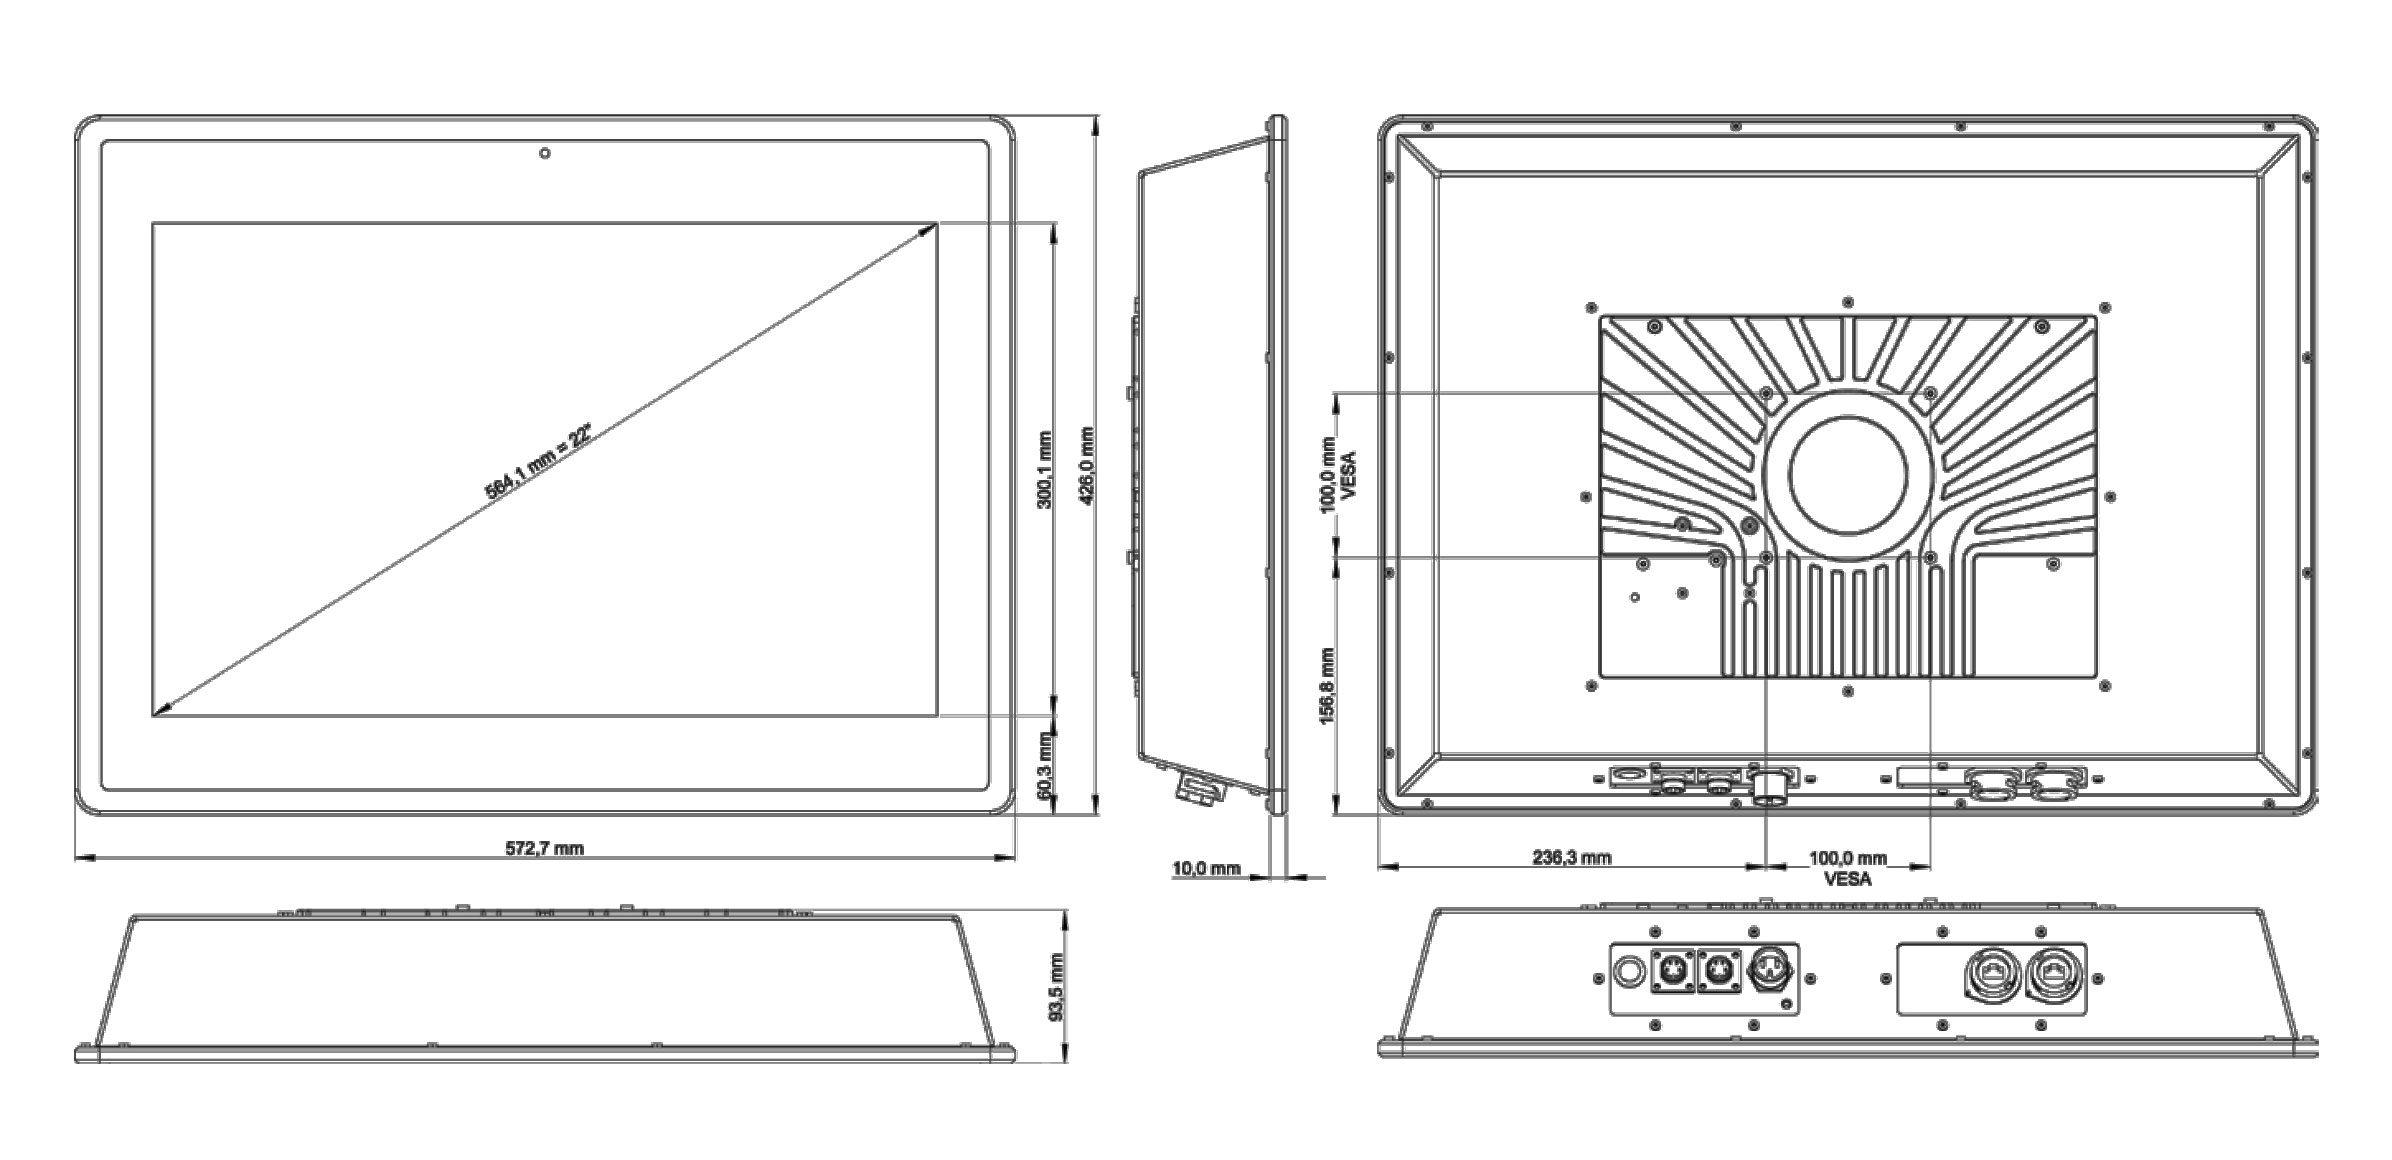 TLSM-220A IP65 Industrie-Monitor mit Touchscreen (Skizze)